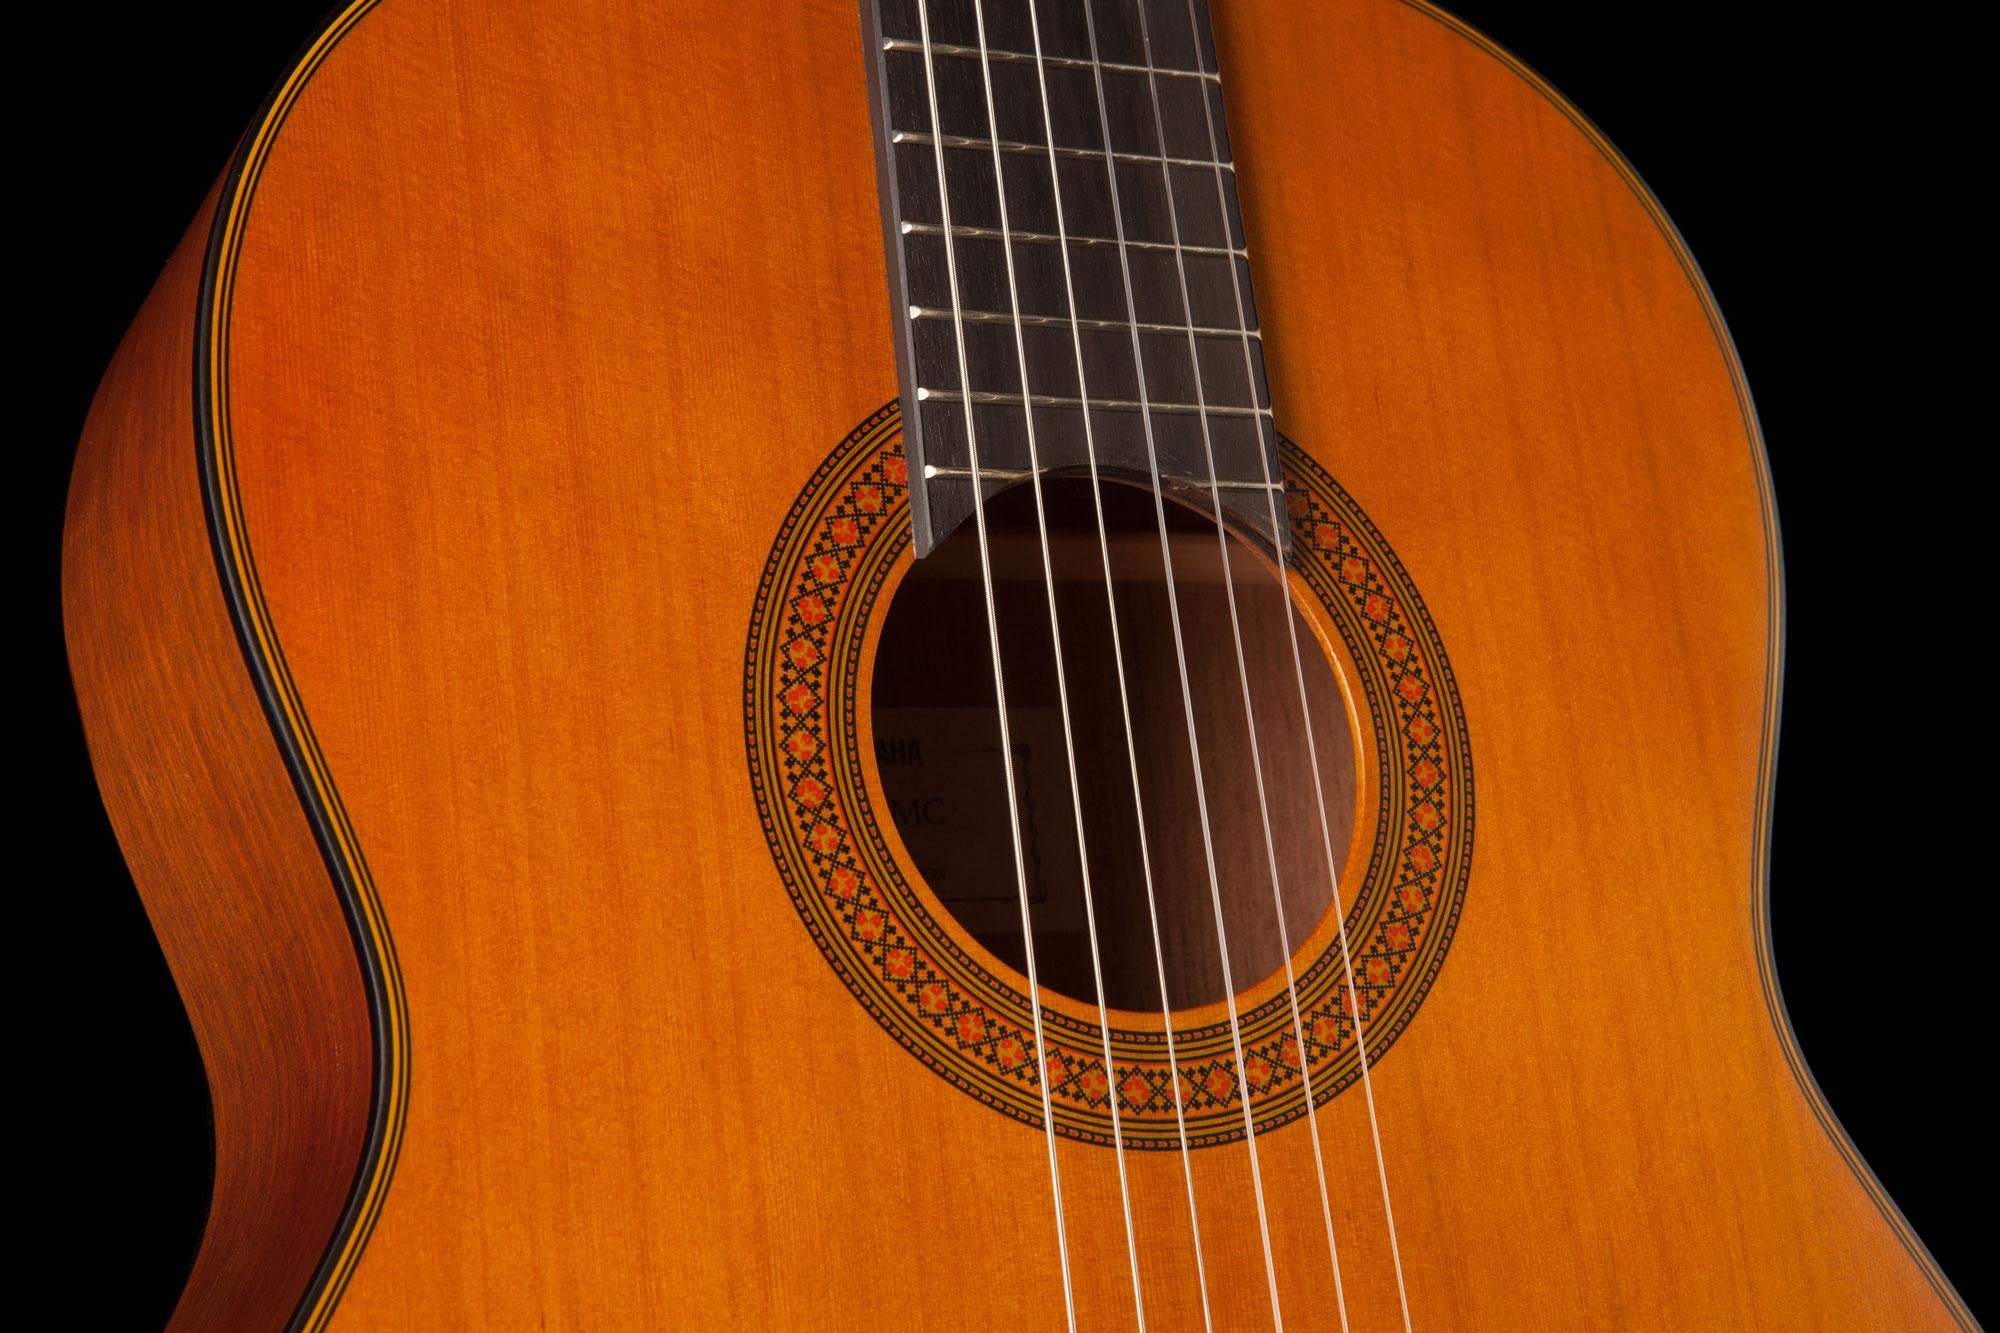 yamaha cg122mc solid cedar top classical guitar in natural finish yamaha music london. Black Bedroom Furniture Sets. Home Design Ideas